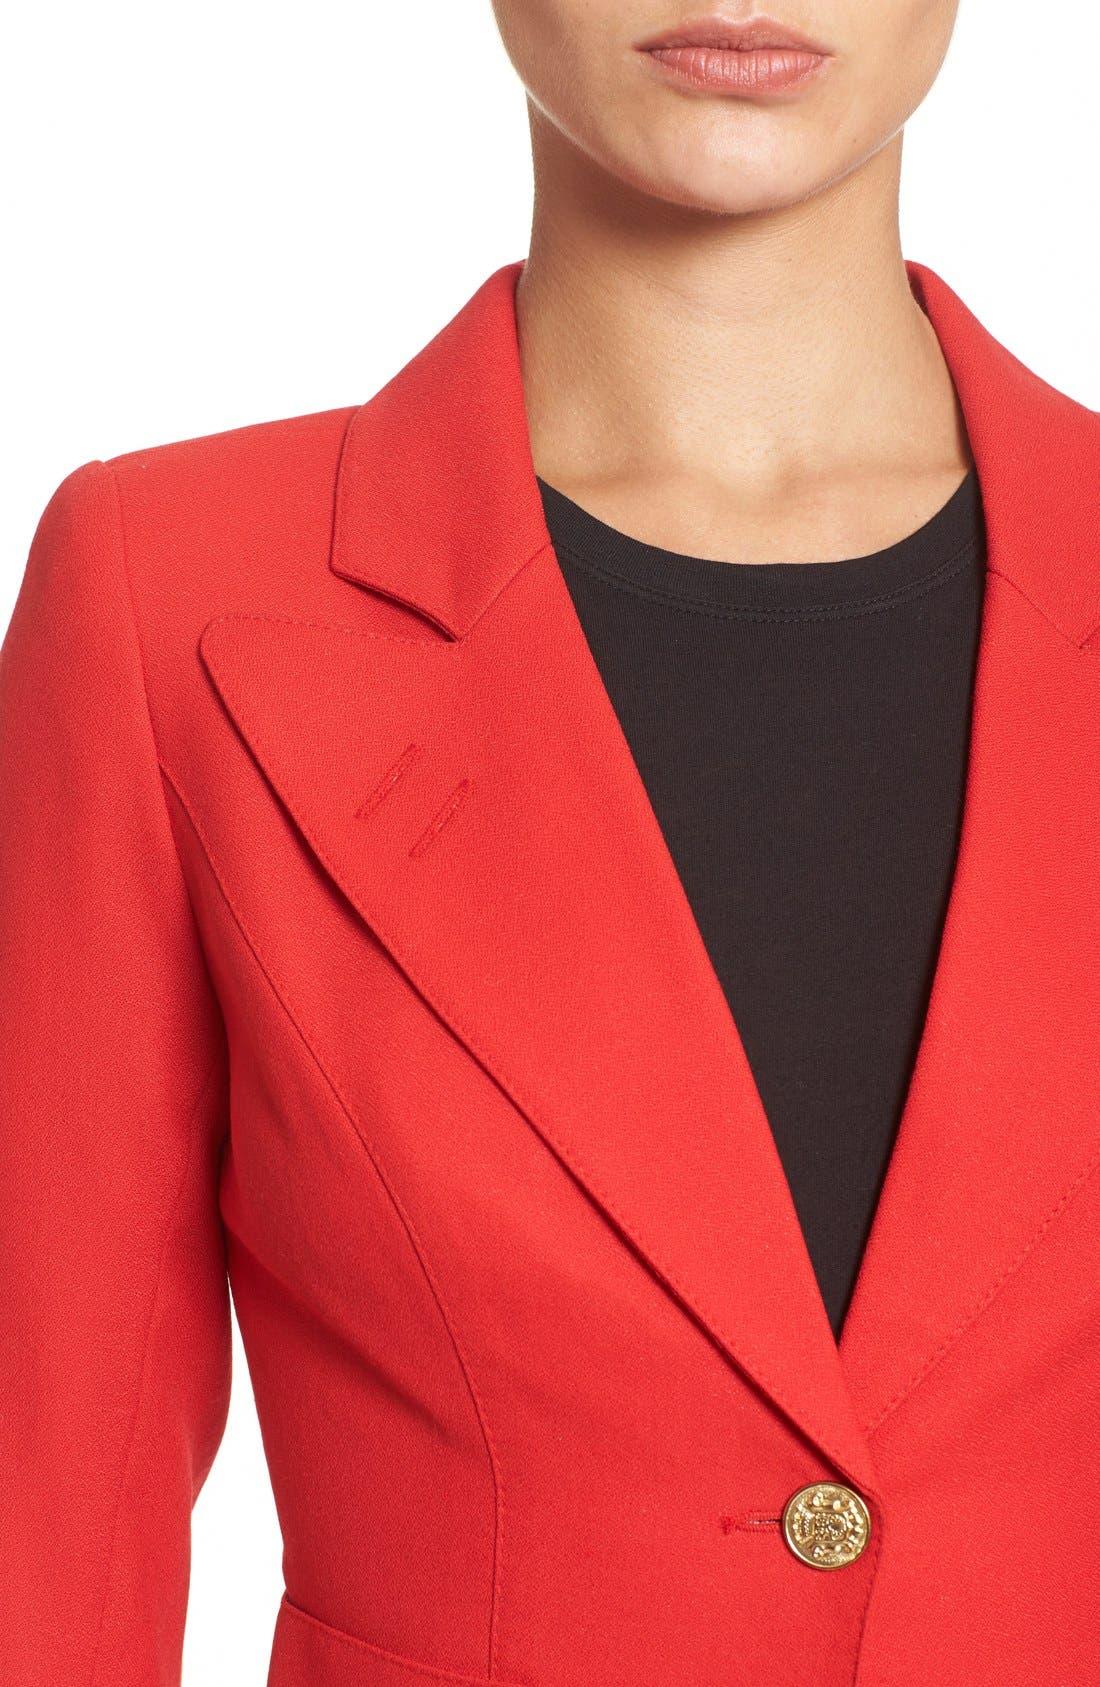 'Duchess' Single Button Blazer,                             Alternate thumbnail 30, color,